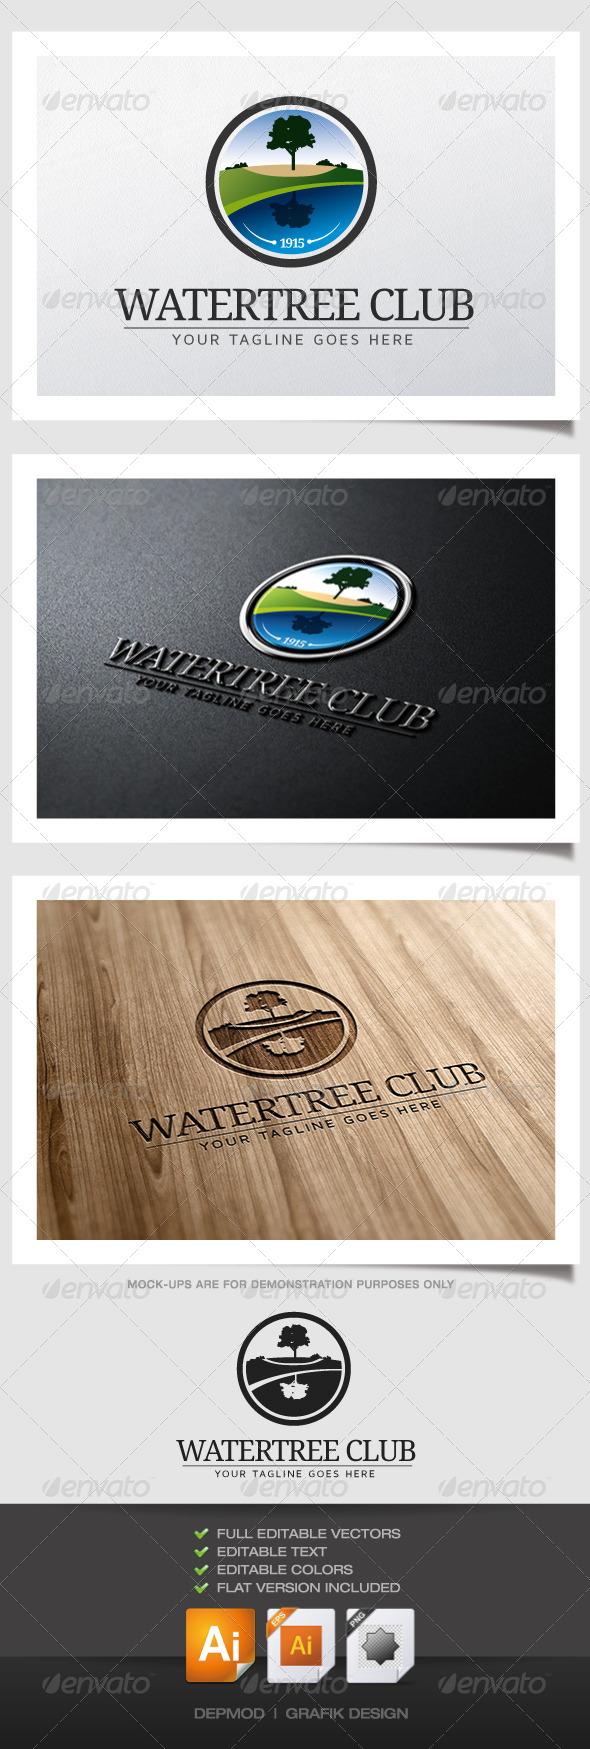 GraphicRiver Watertree Club Logo 6210617